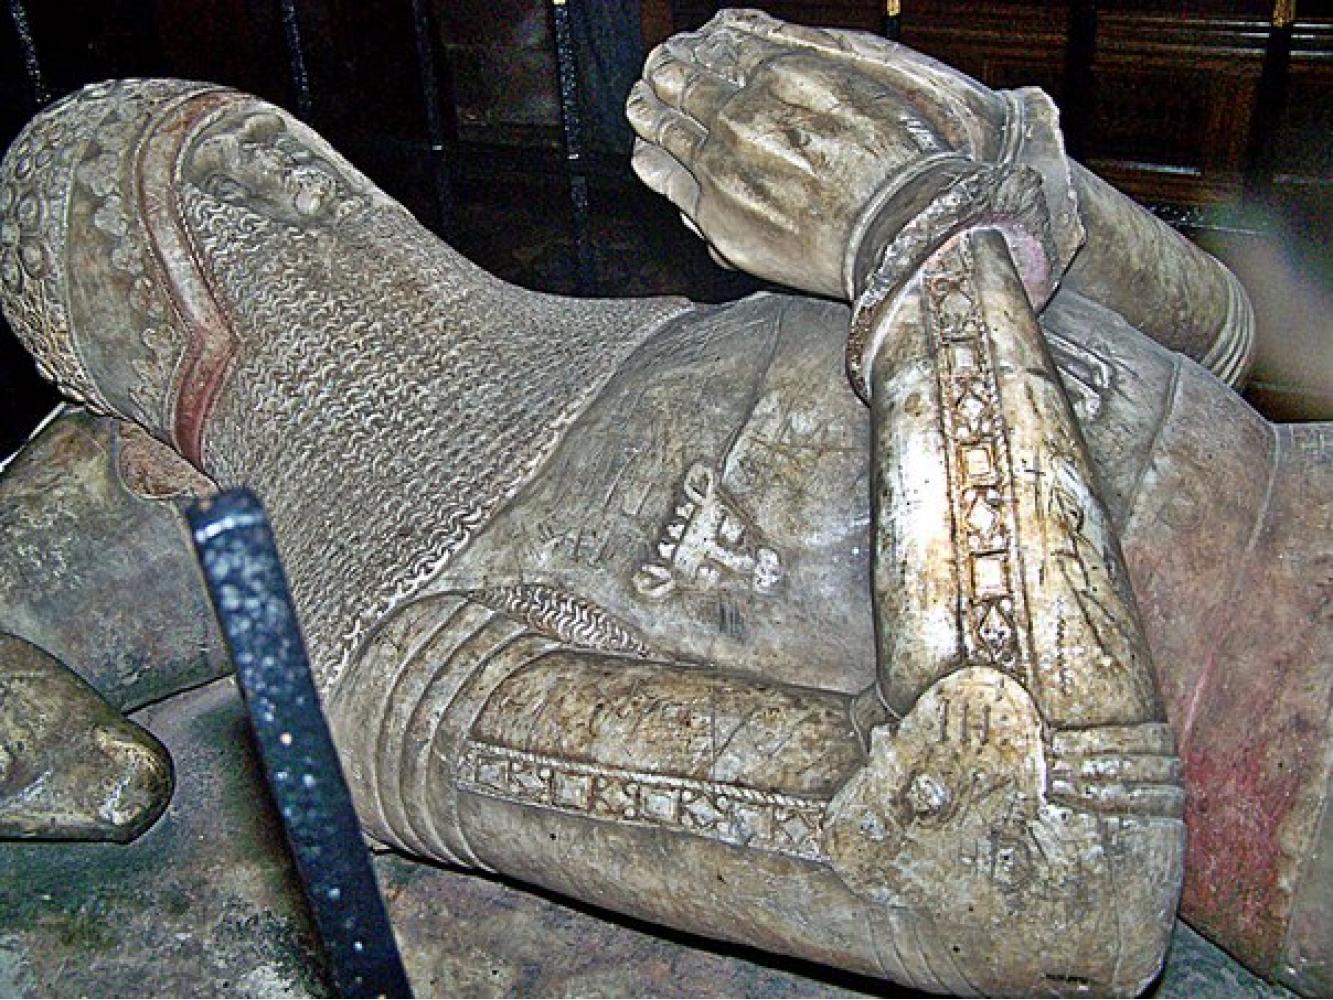 Arms Sir Hugh Calveley: Historical Sources Image